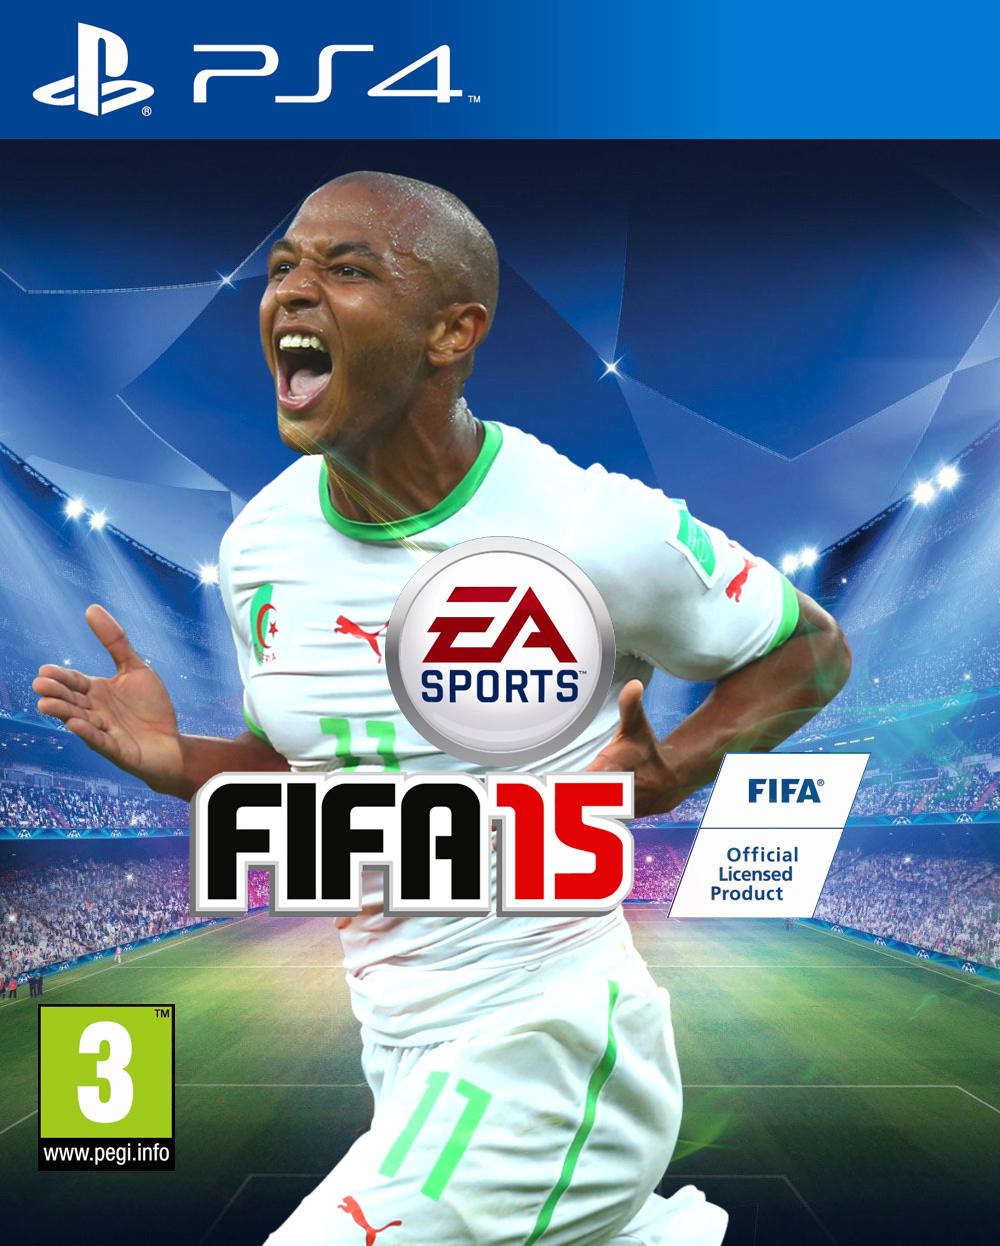 Brahimi Fifa15 Ps4 By Kaamzzo On Deviantart